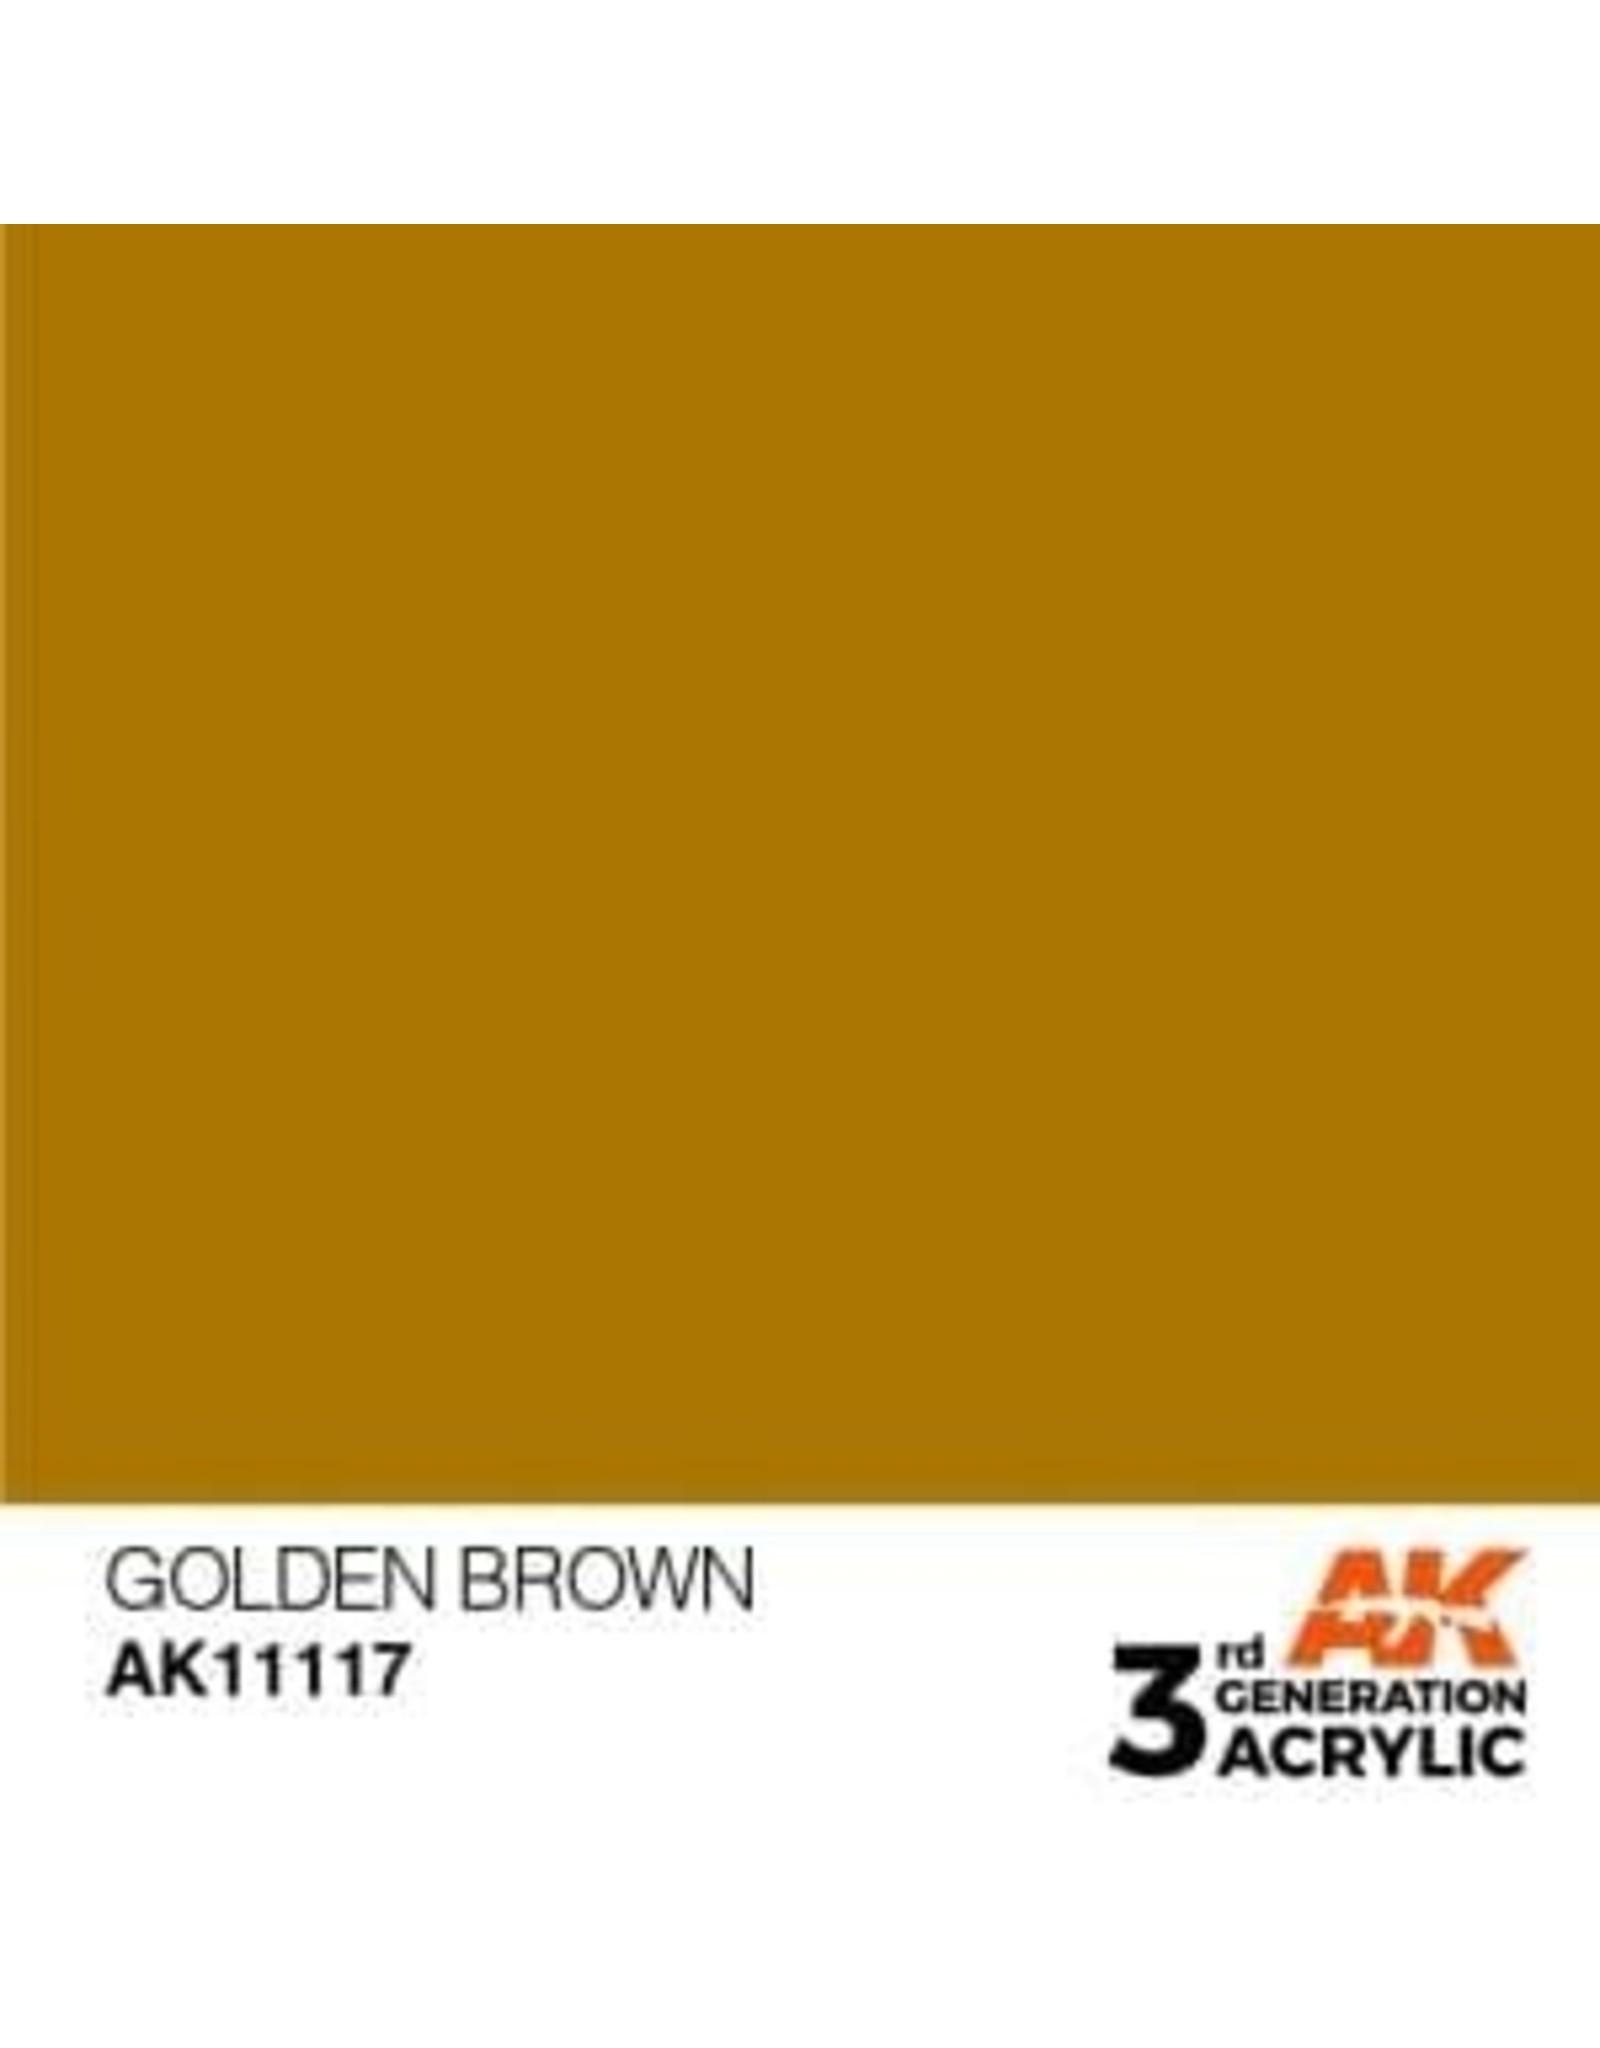 AK Interactive 3RD GEN ACRYLIC GOLDEN BROWN 17ML